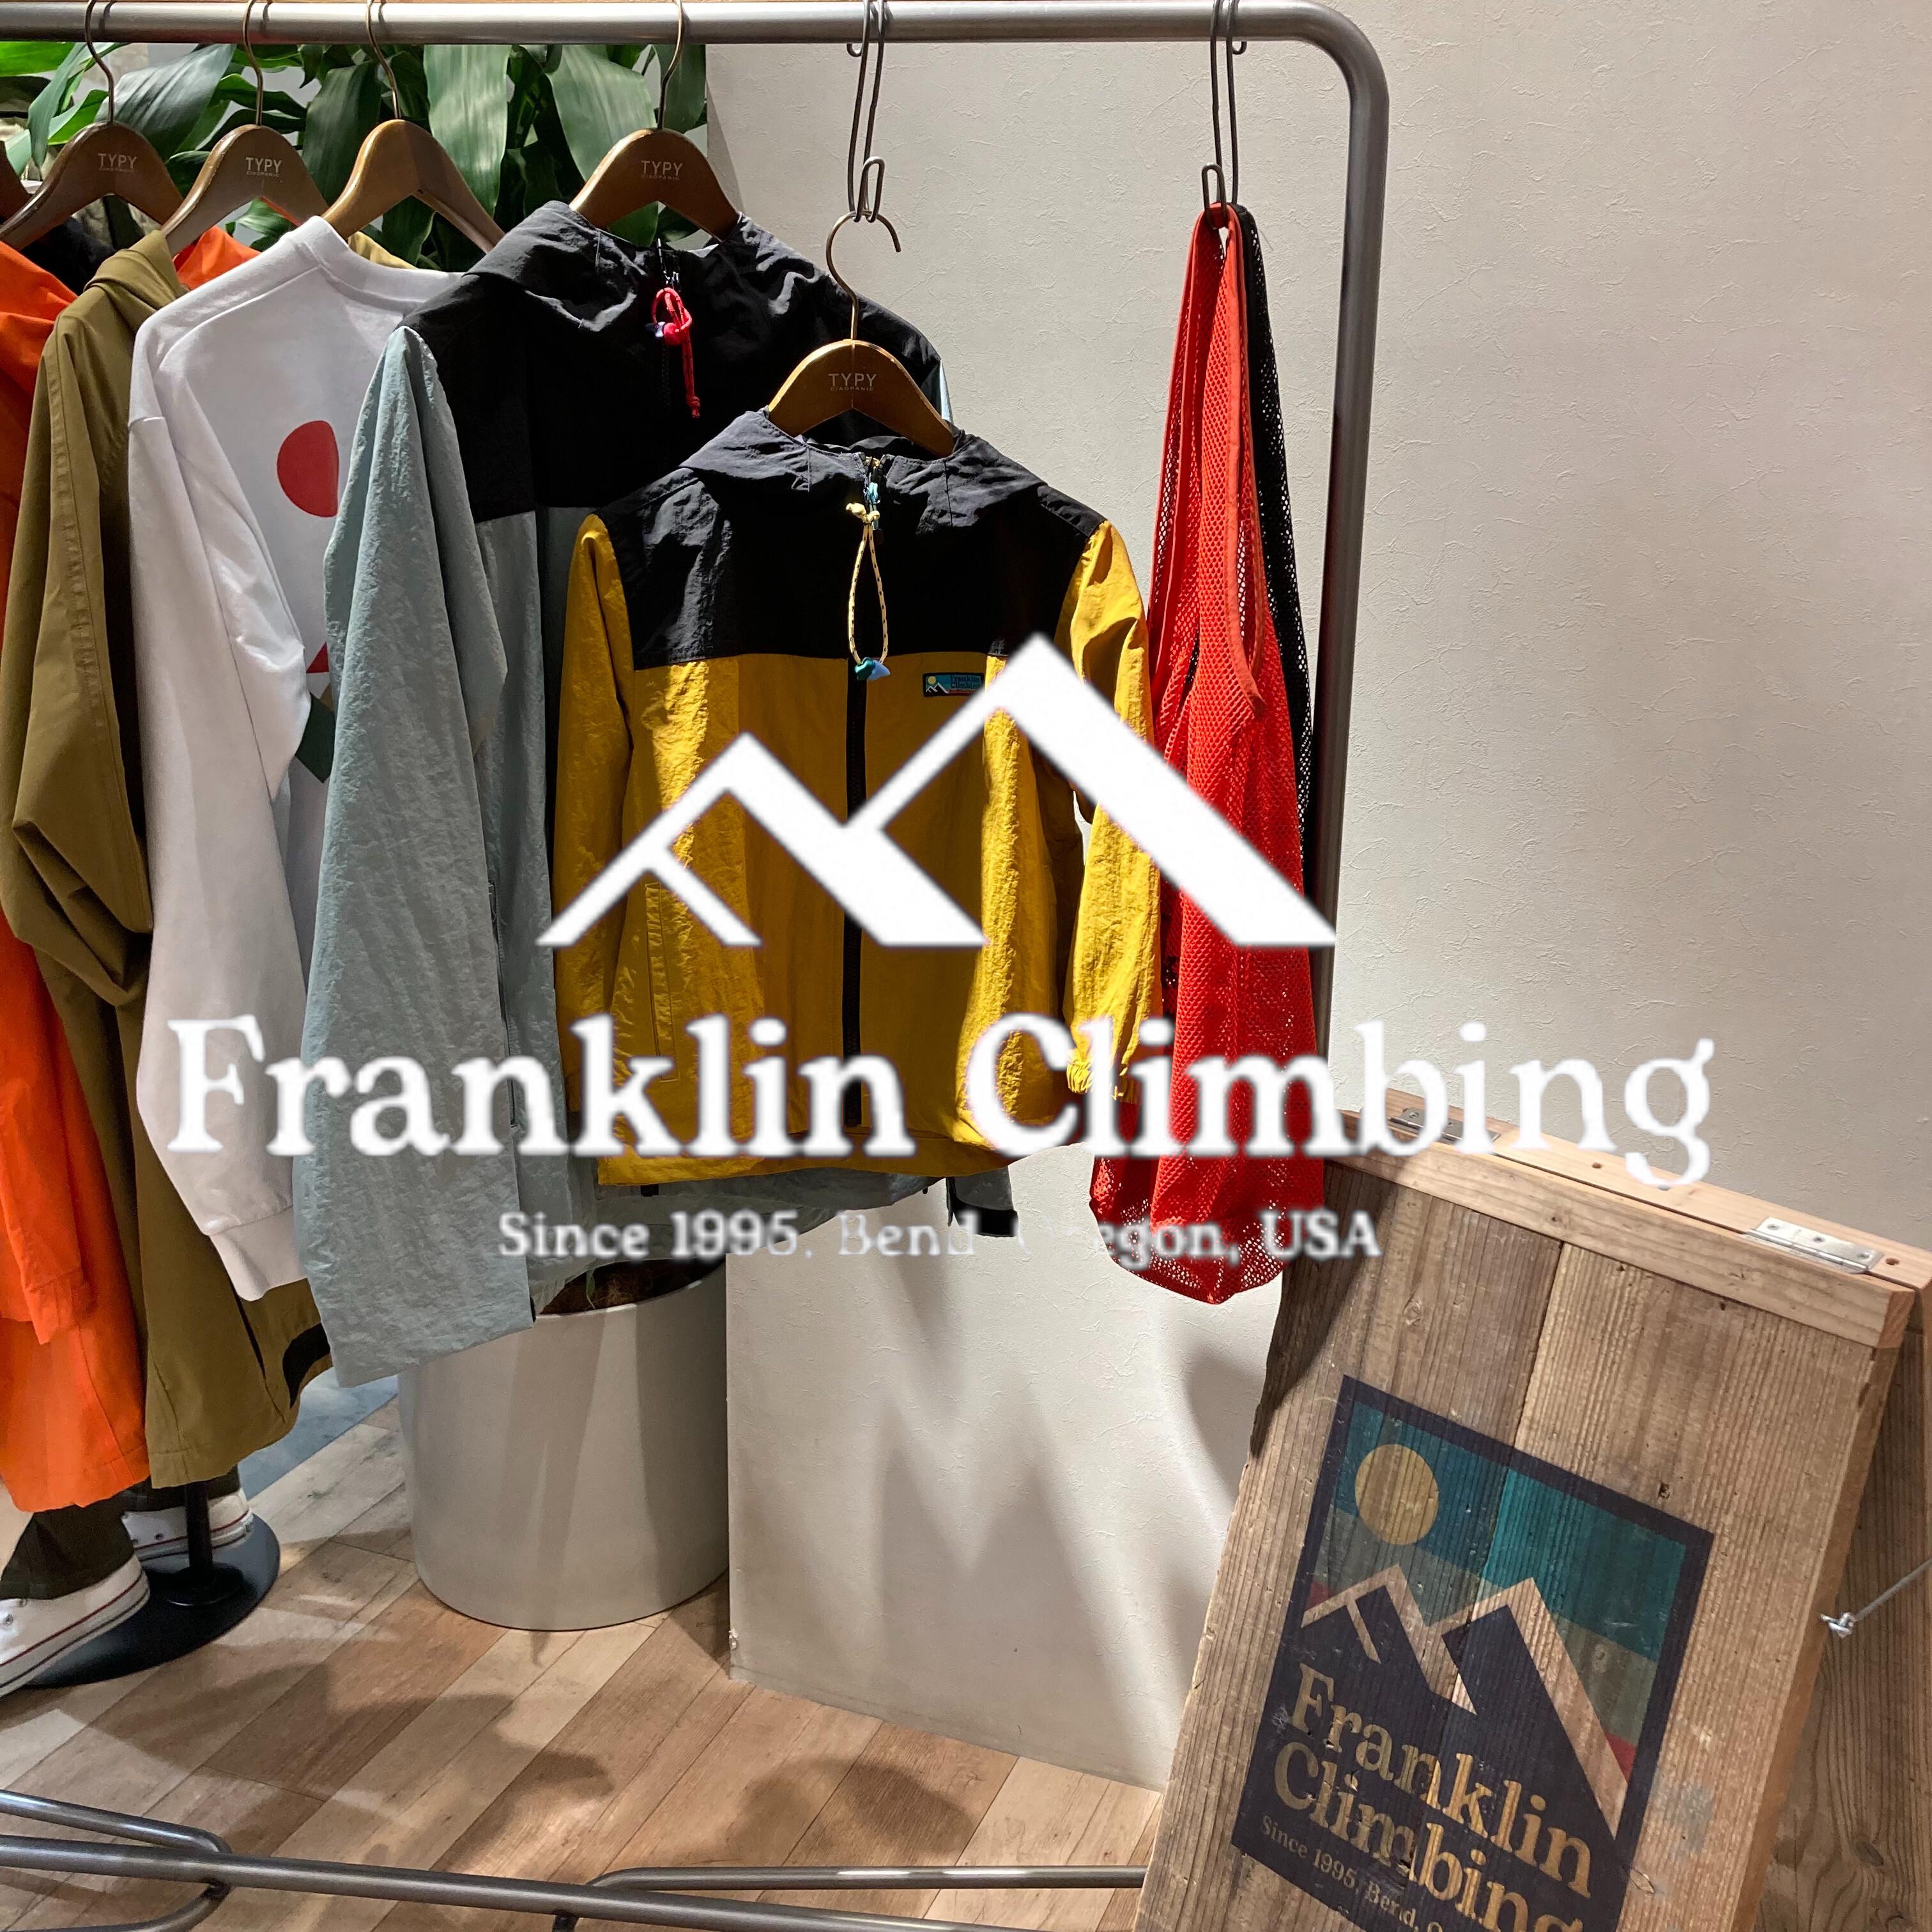 【FranklinClimbing】独占販売!